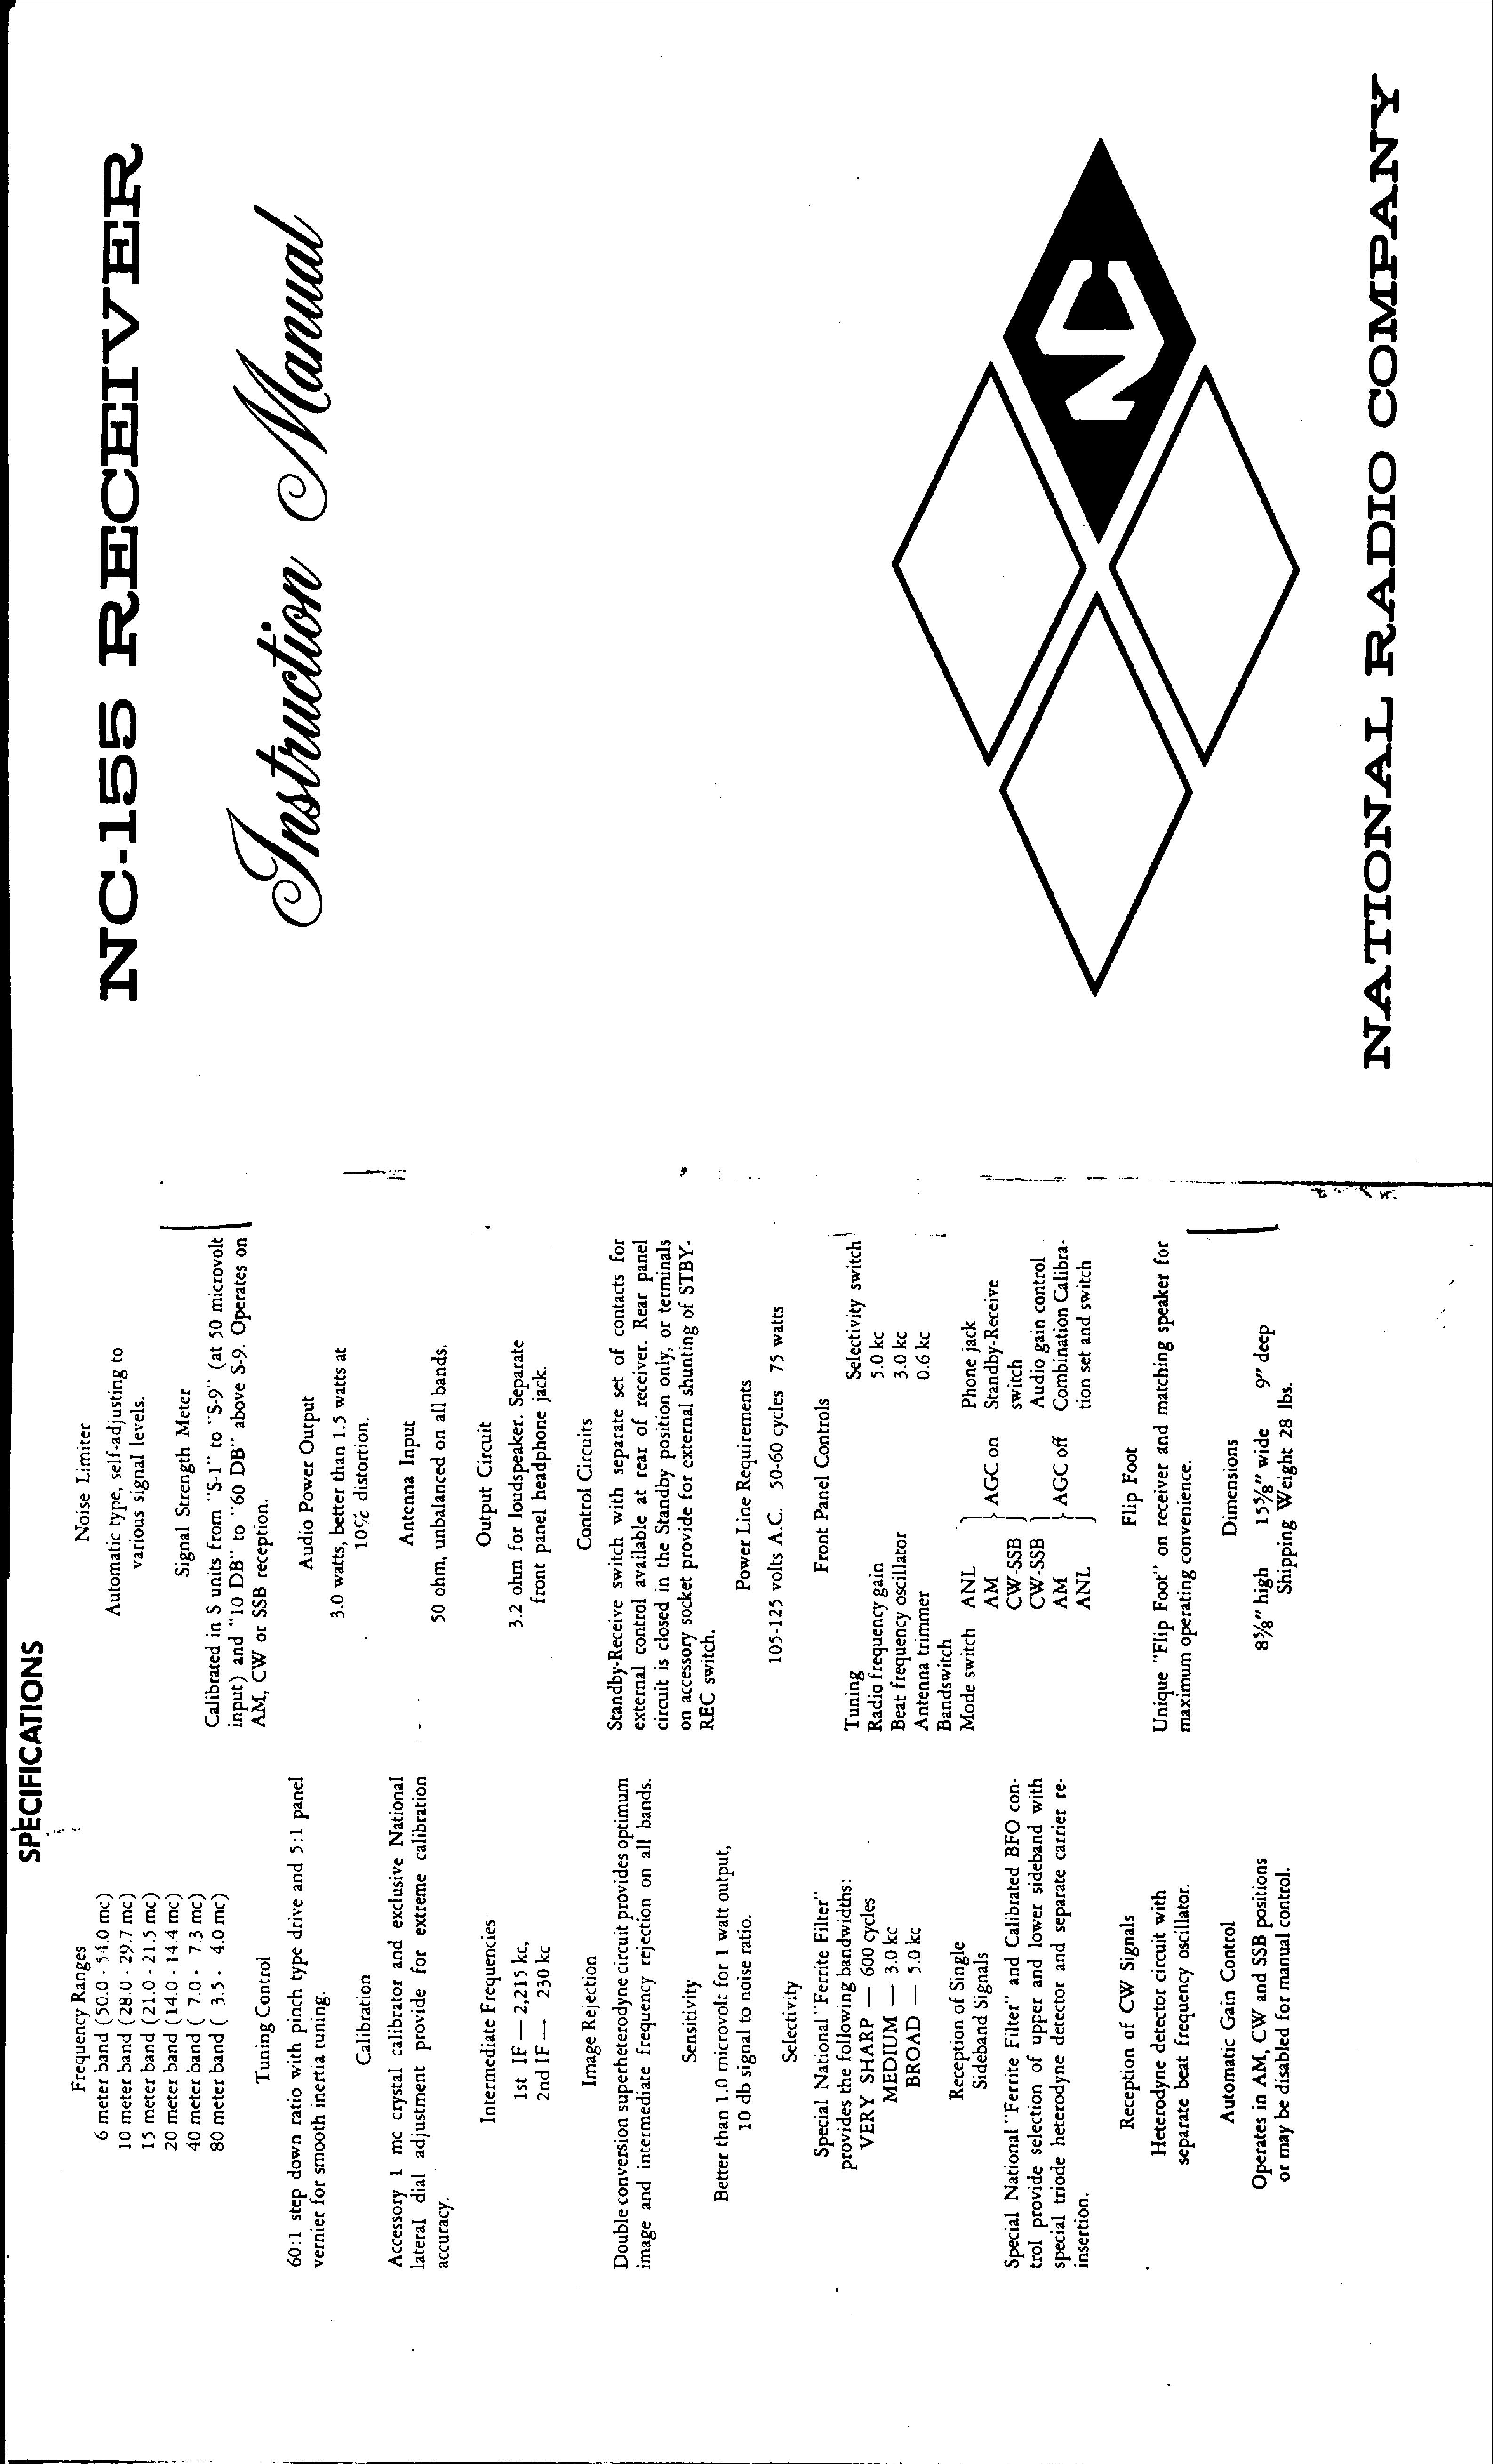 NATIONAL NC-155 RECEIVER Service Manual download, schematics, eeprom